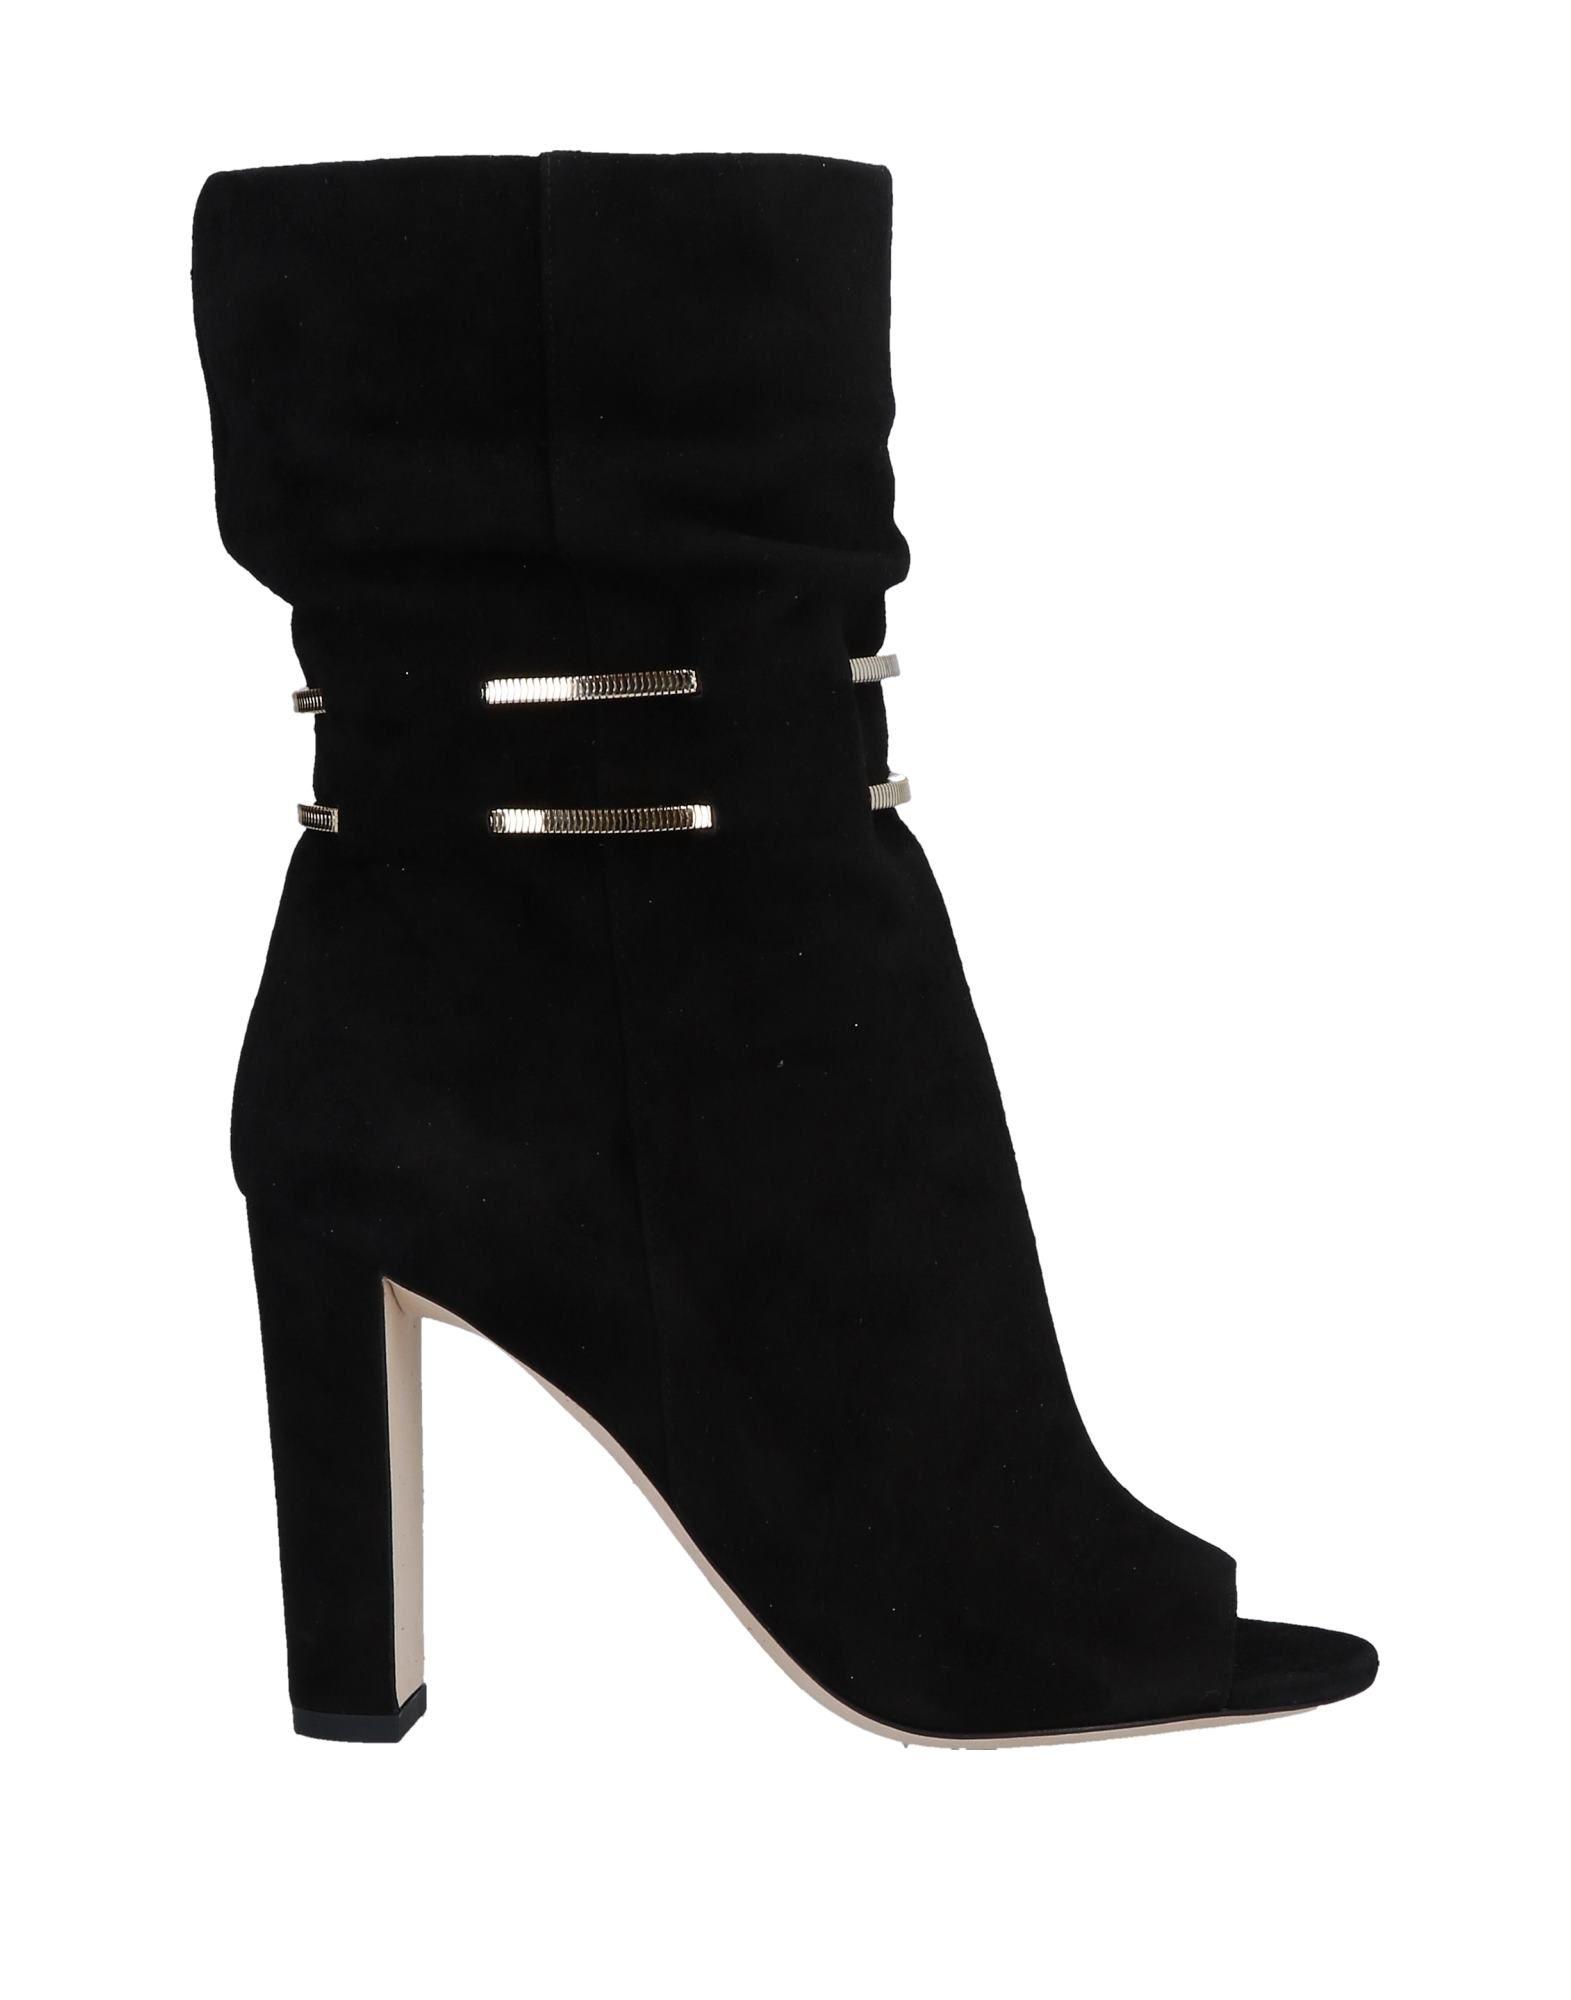 Jimmy Choo Ankle Boot - Women Jimmy Choo  Ankle Boots online on  Choo United Kingdom - 11563232LM 8f1710